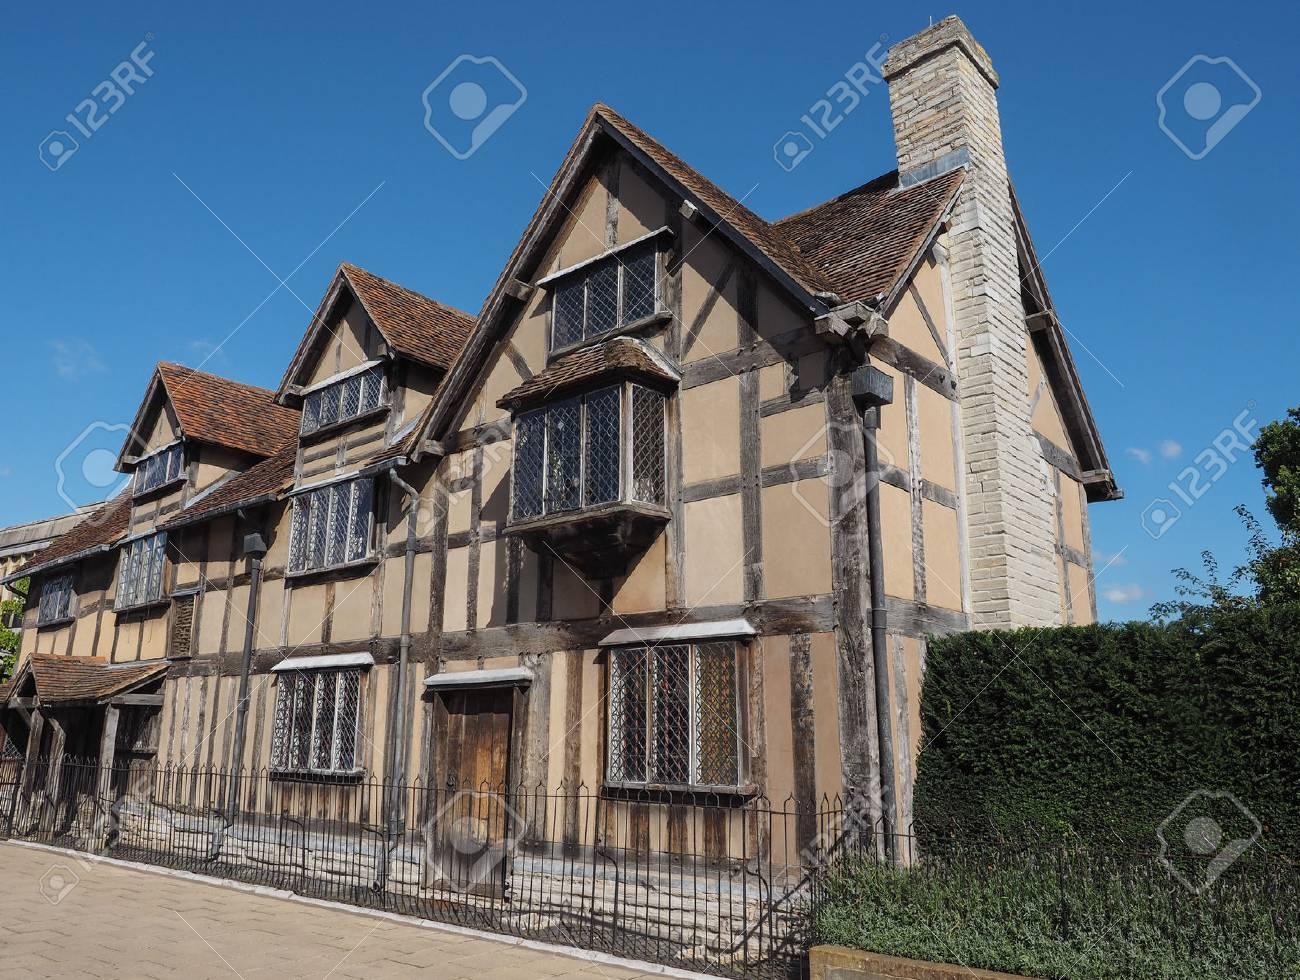 William Shakespeare Birthplace In Stratford Upon Avon UK Stock